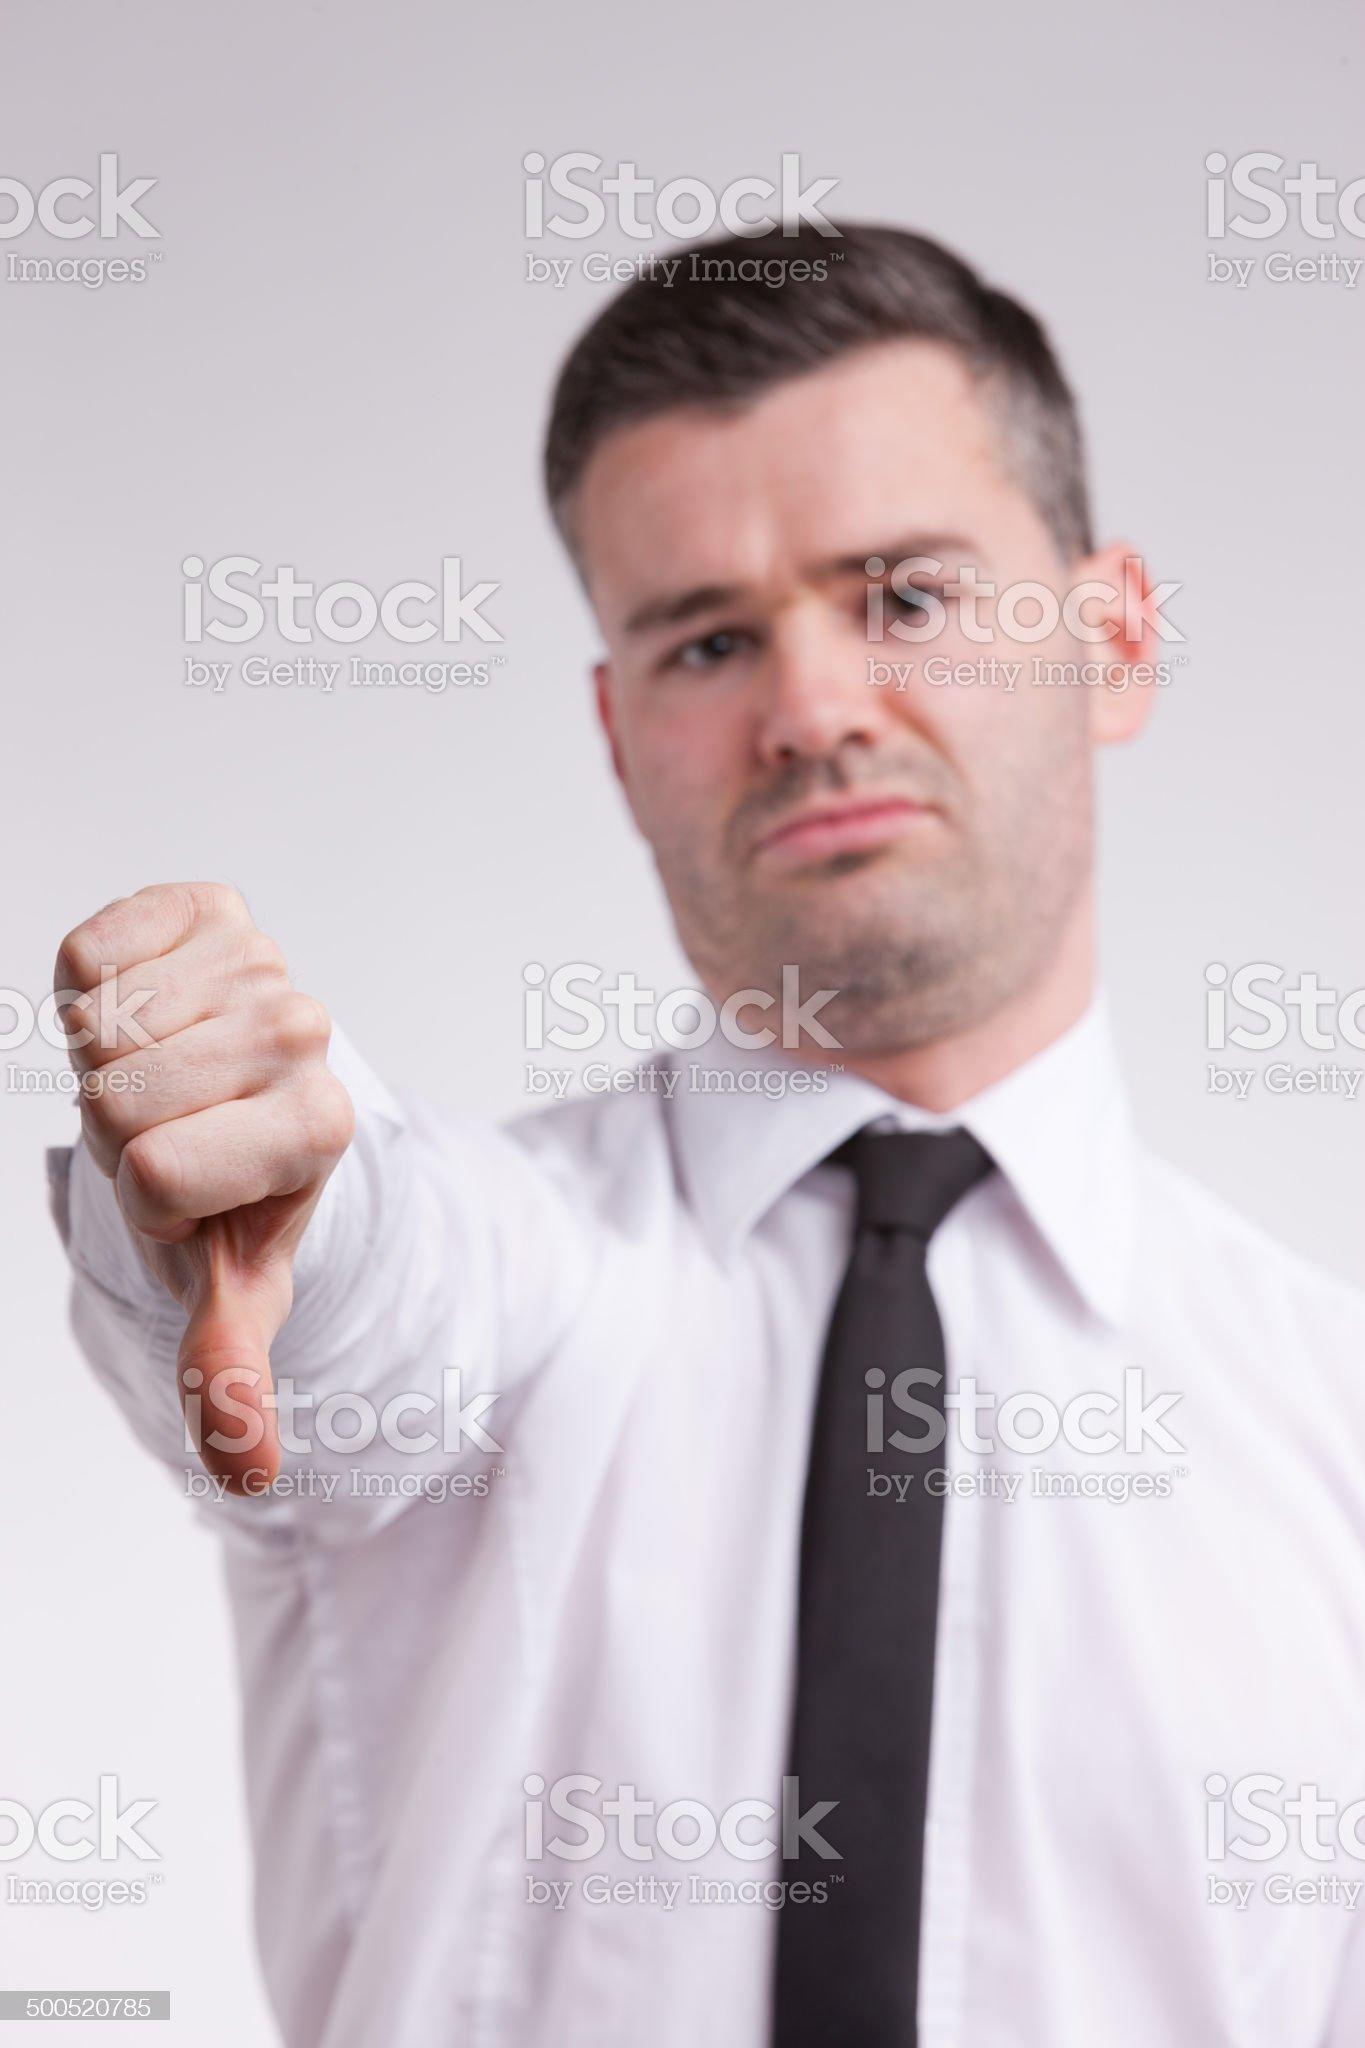 man thumbs down royalty-free stock photo